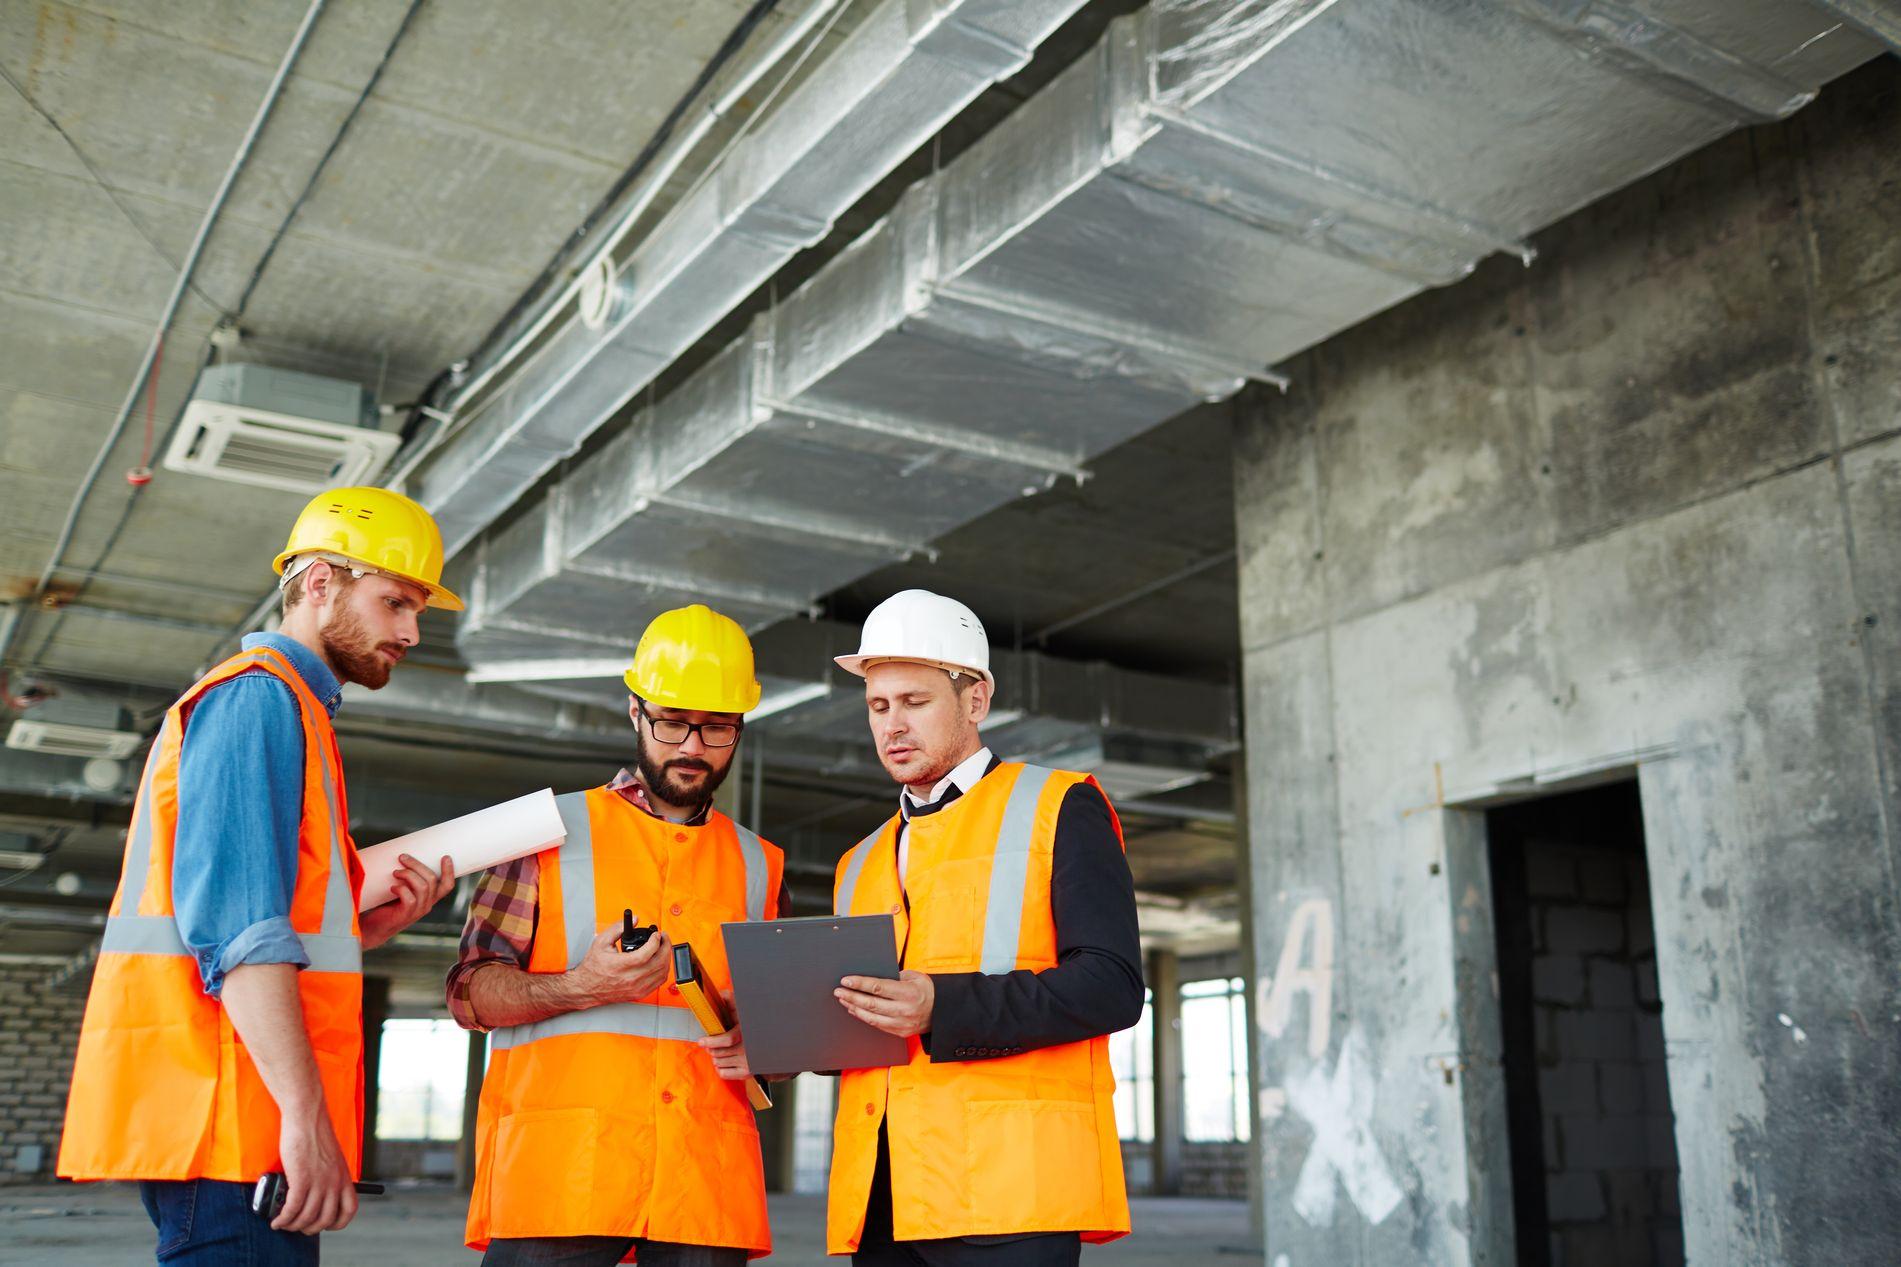 Zutec Safety Inspections